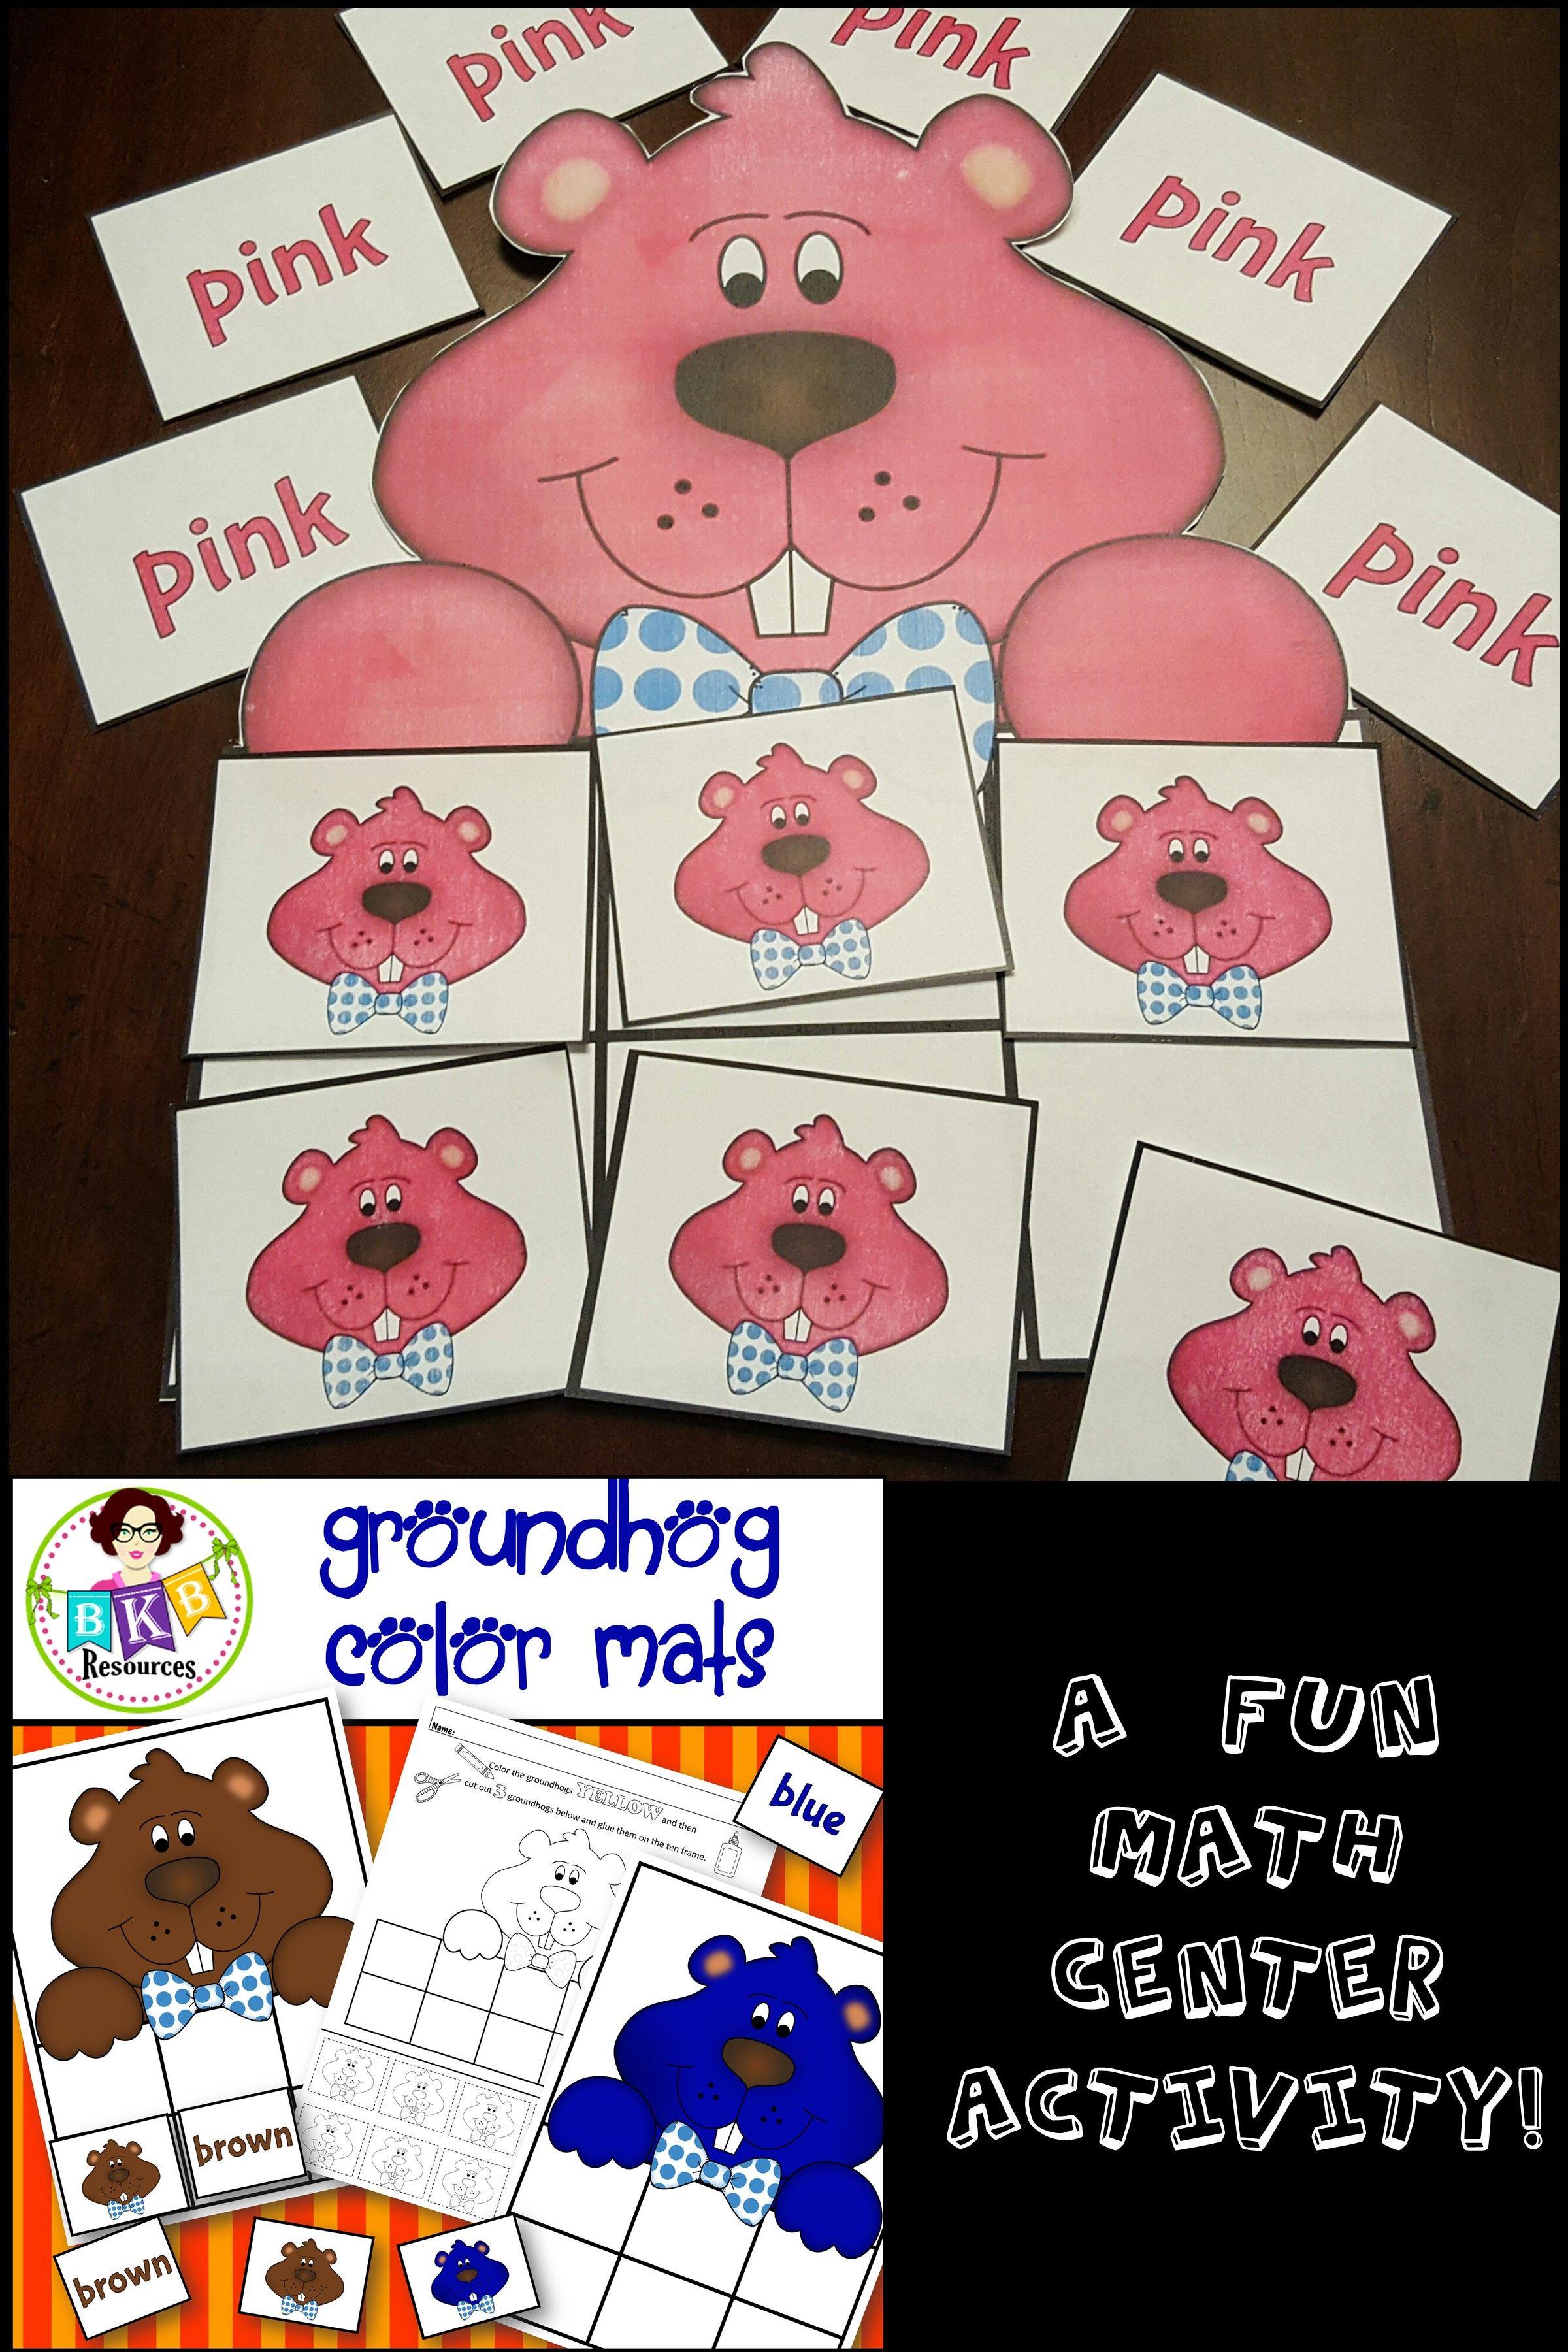 Sorting Groundhog Color Mats Colors Printable